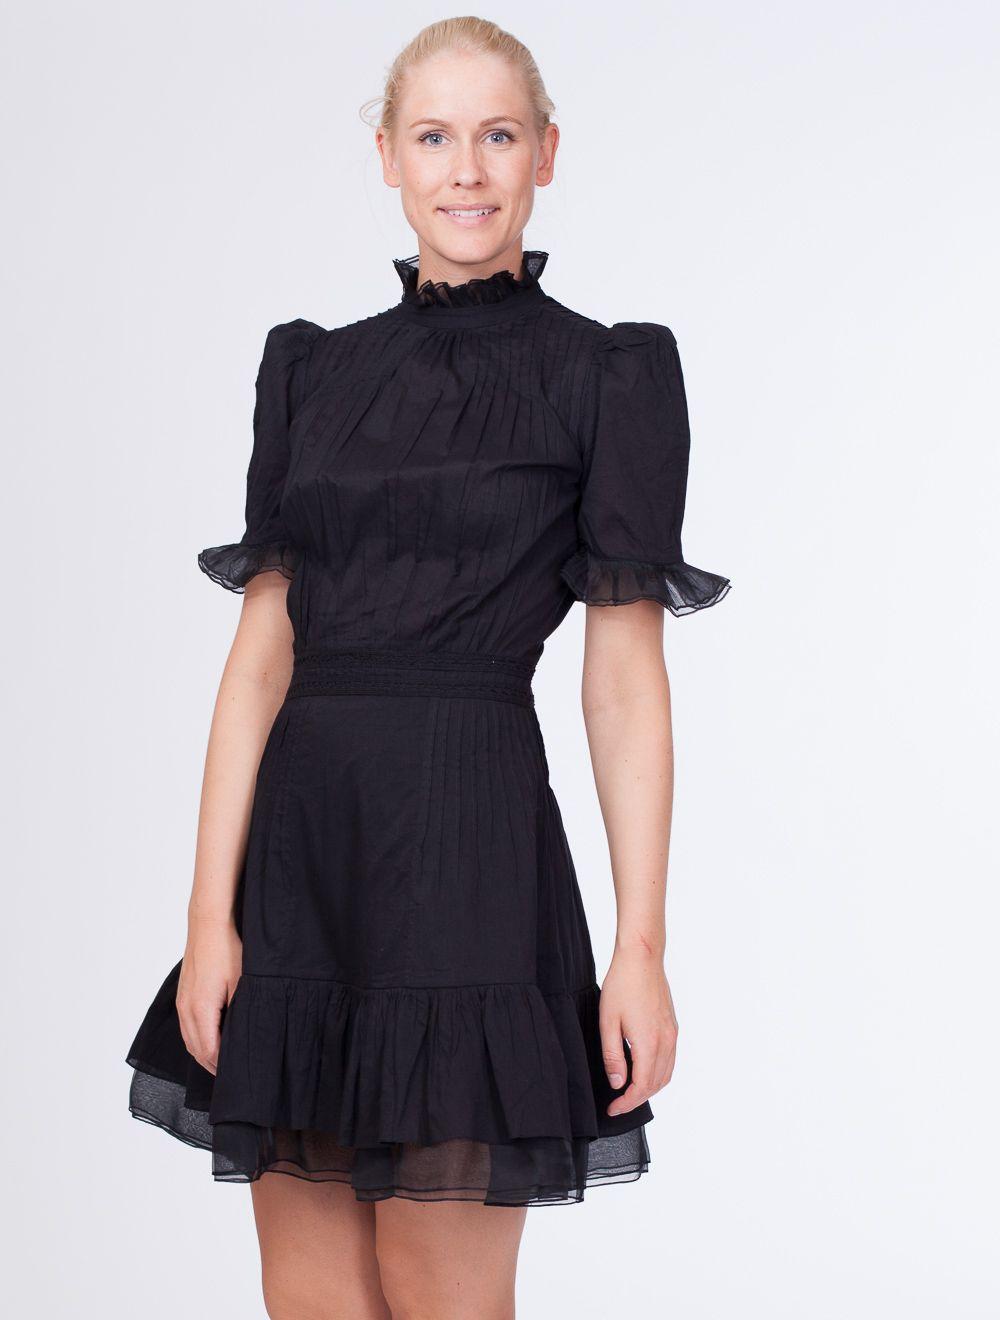 a5b158ef Amelia Dress svart fra Pia Tjelta er en nydelig kort sommerkjole med fine  detaljer. Halsen